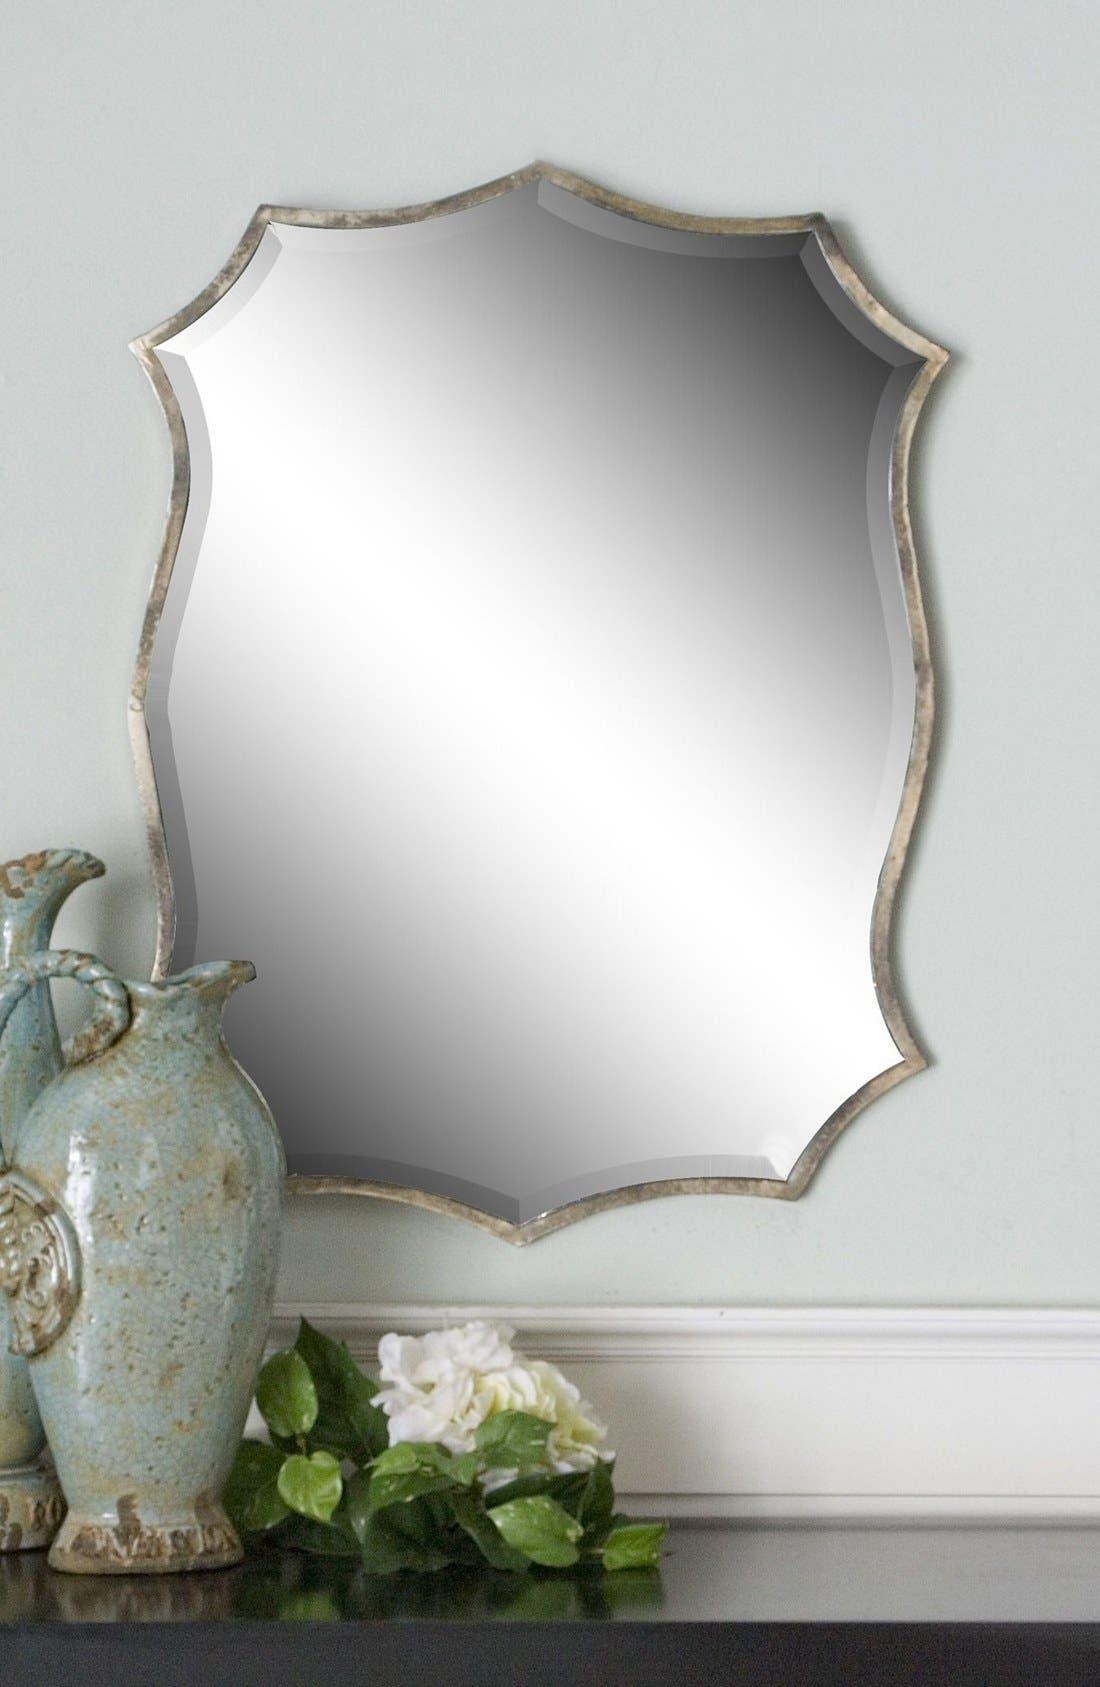 Alternate Image 3  - Uttermost 'Migiana' Oxidized Nickel Wall Mirror